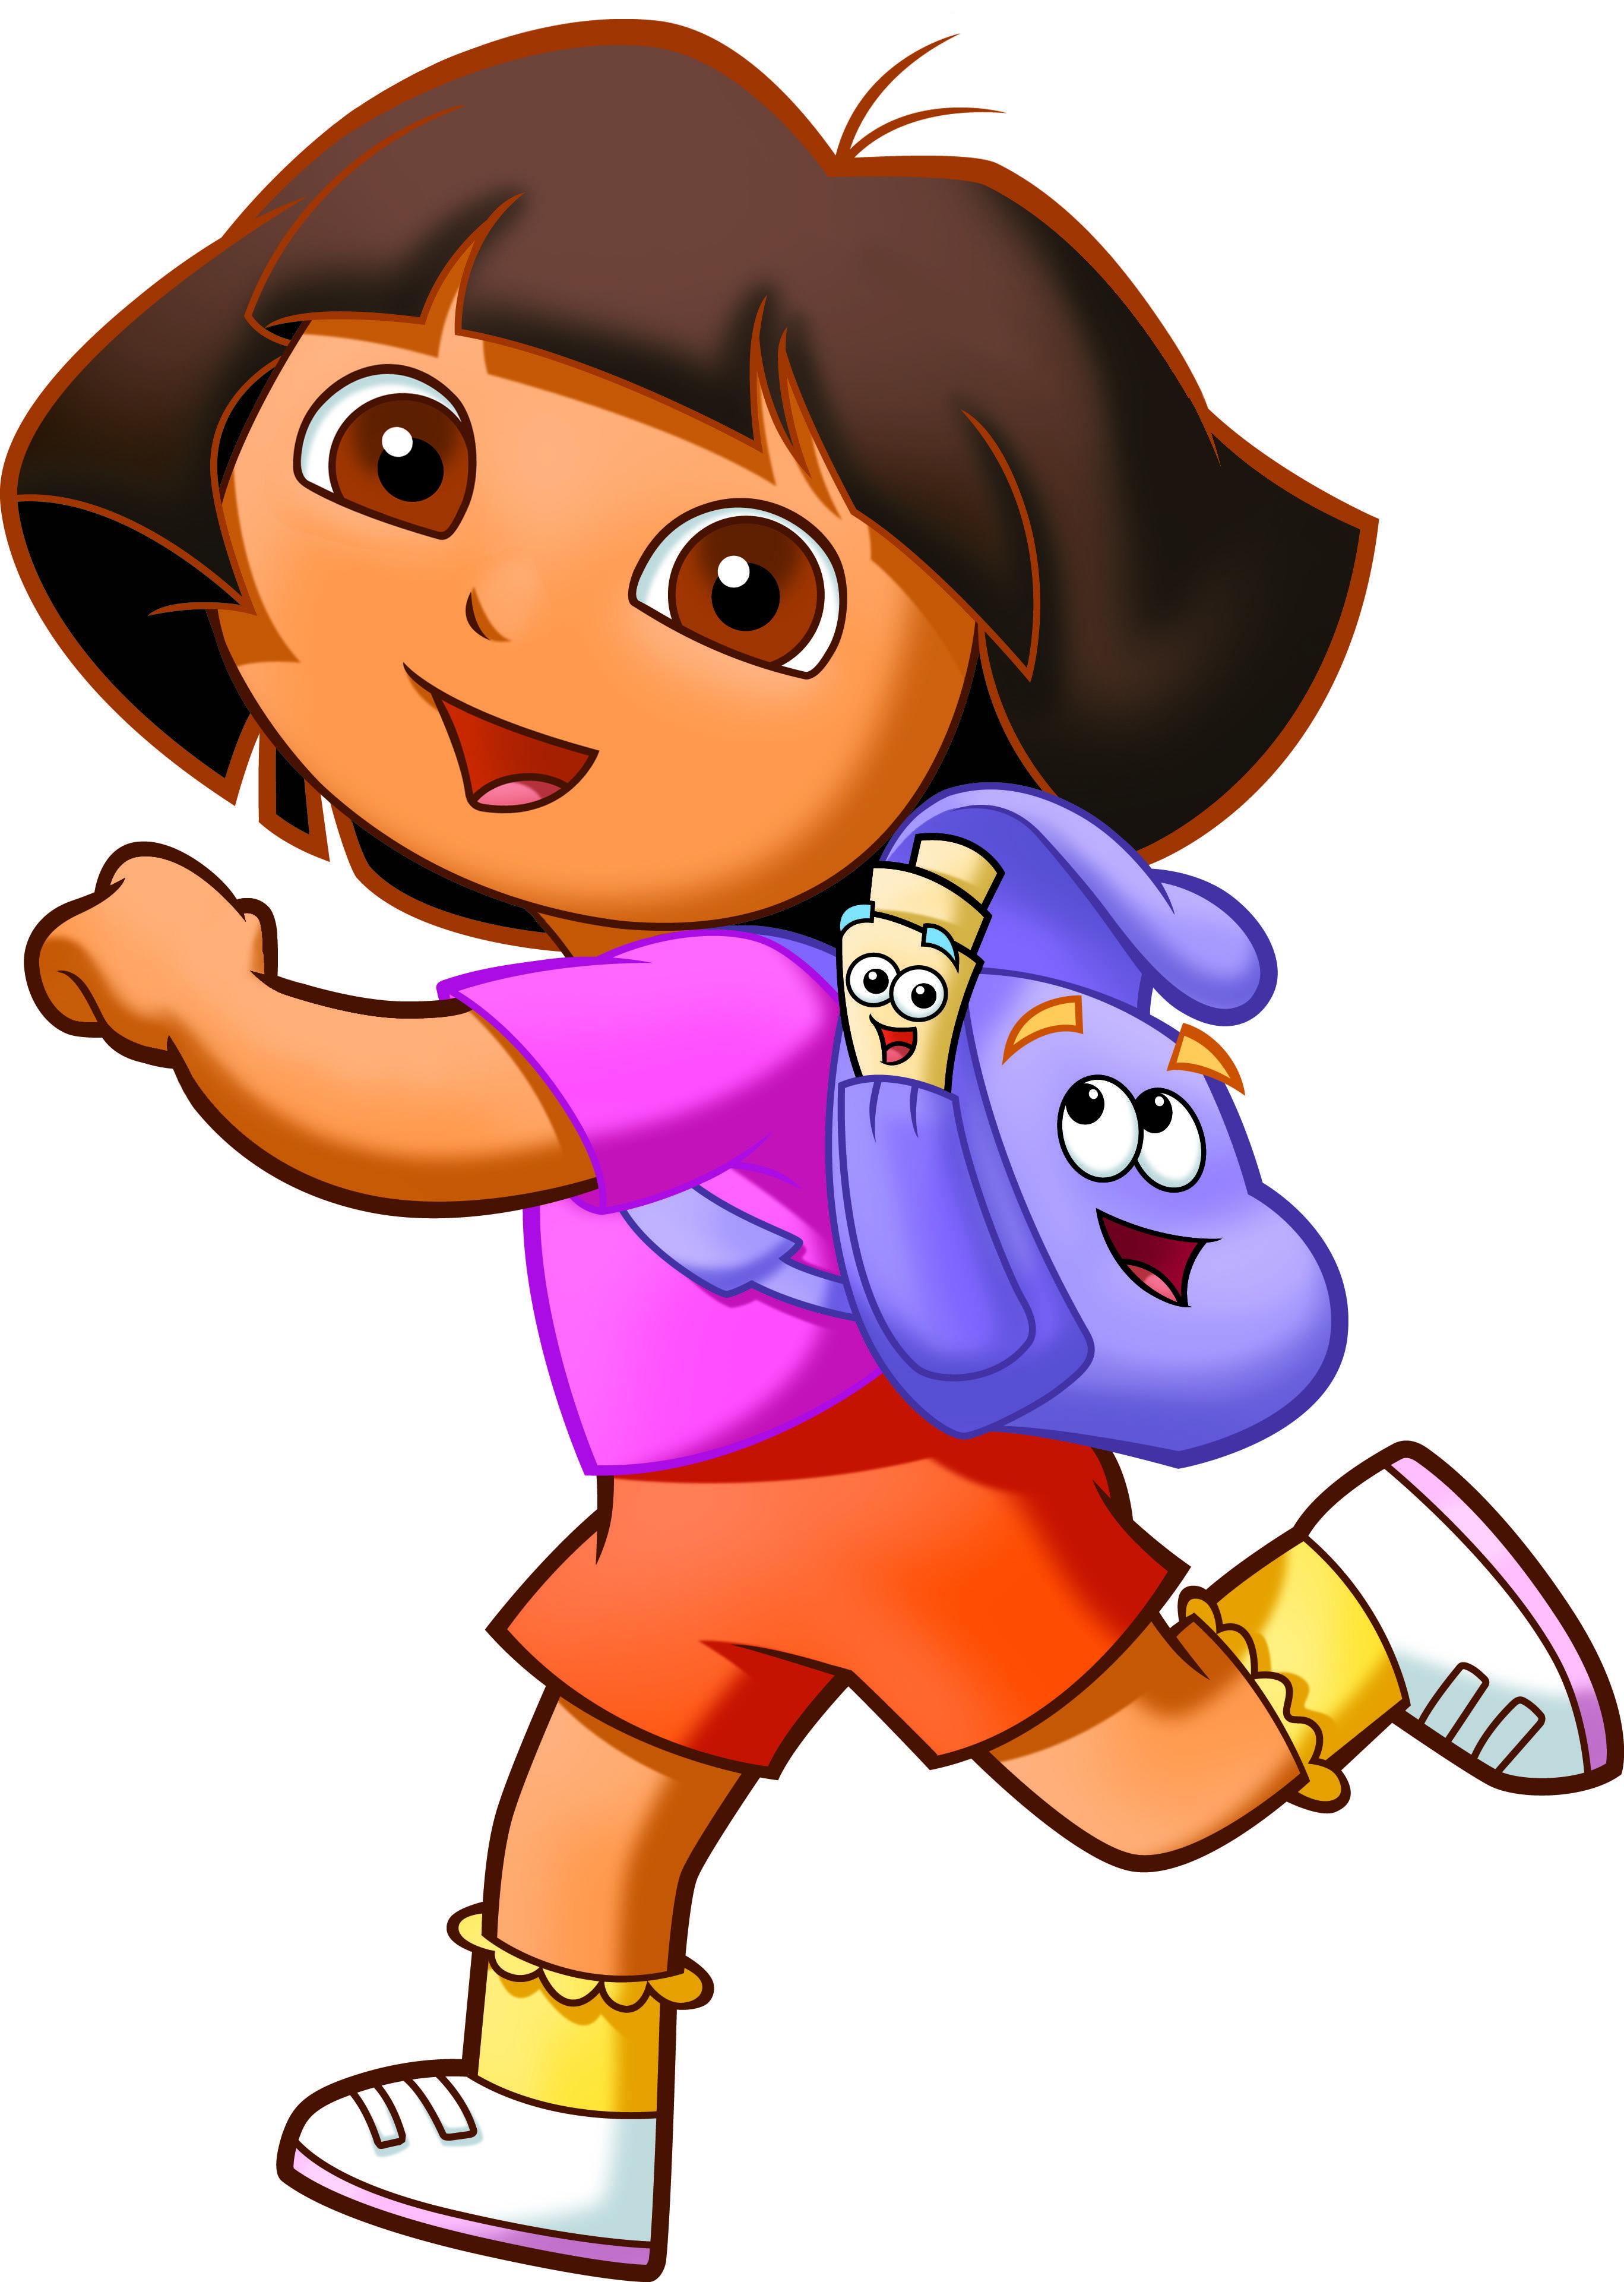 Amazing Dora The Explorer Pictures & Backgrounds